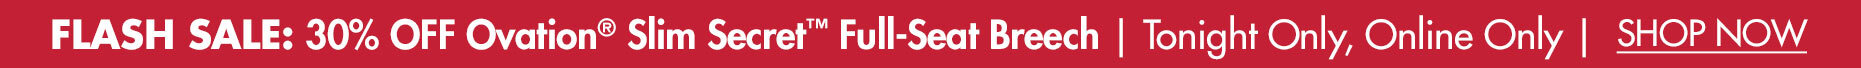 30% OFF Ovation® Slim Secret™ Full-Seat Breech